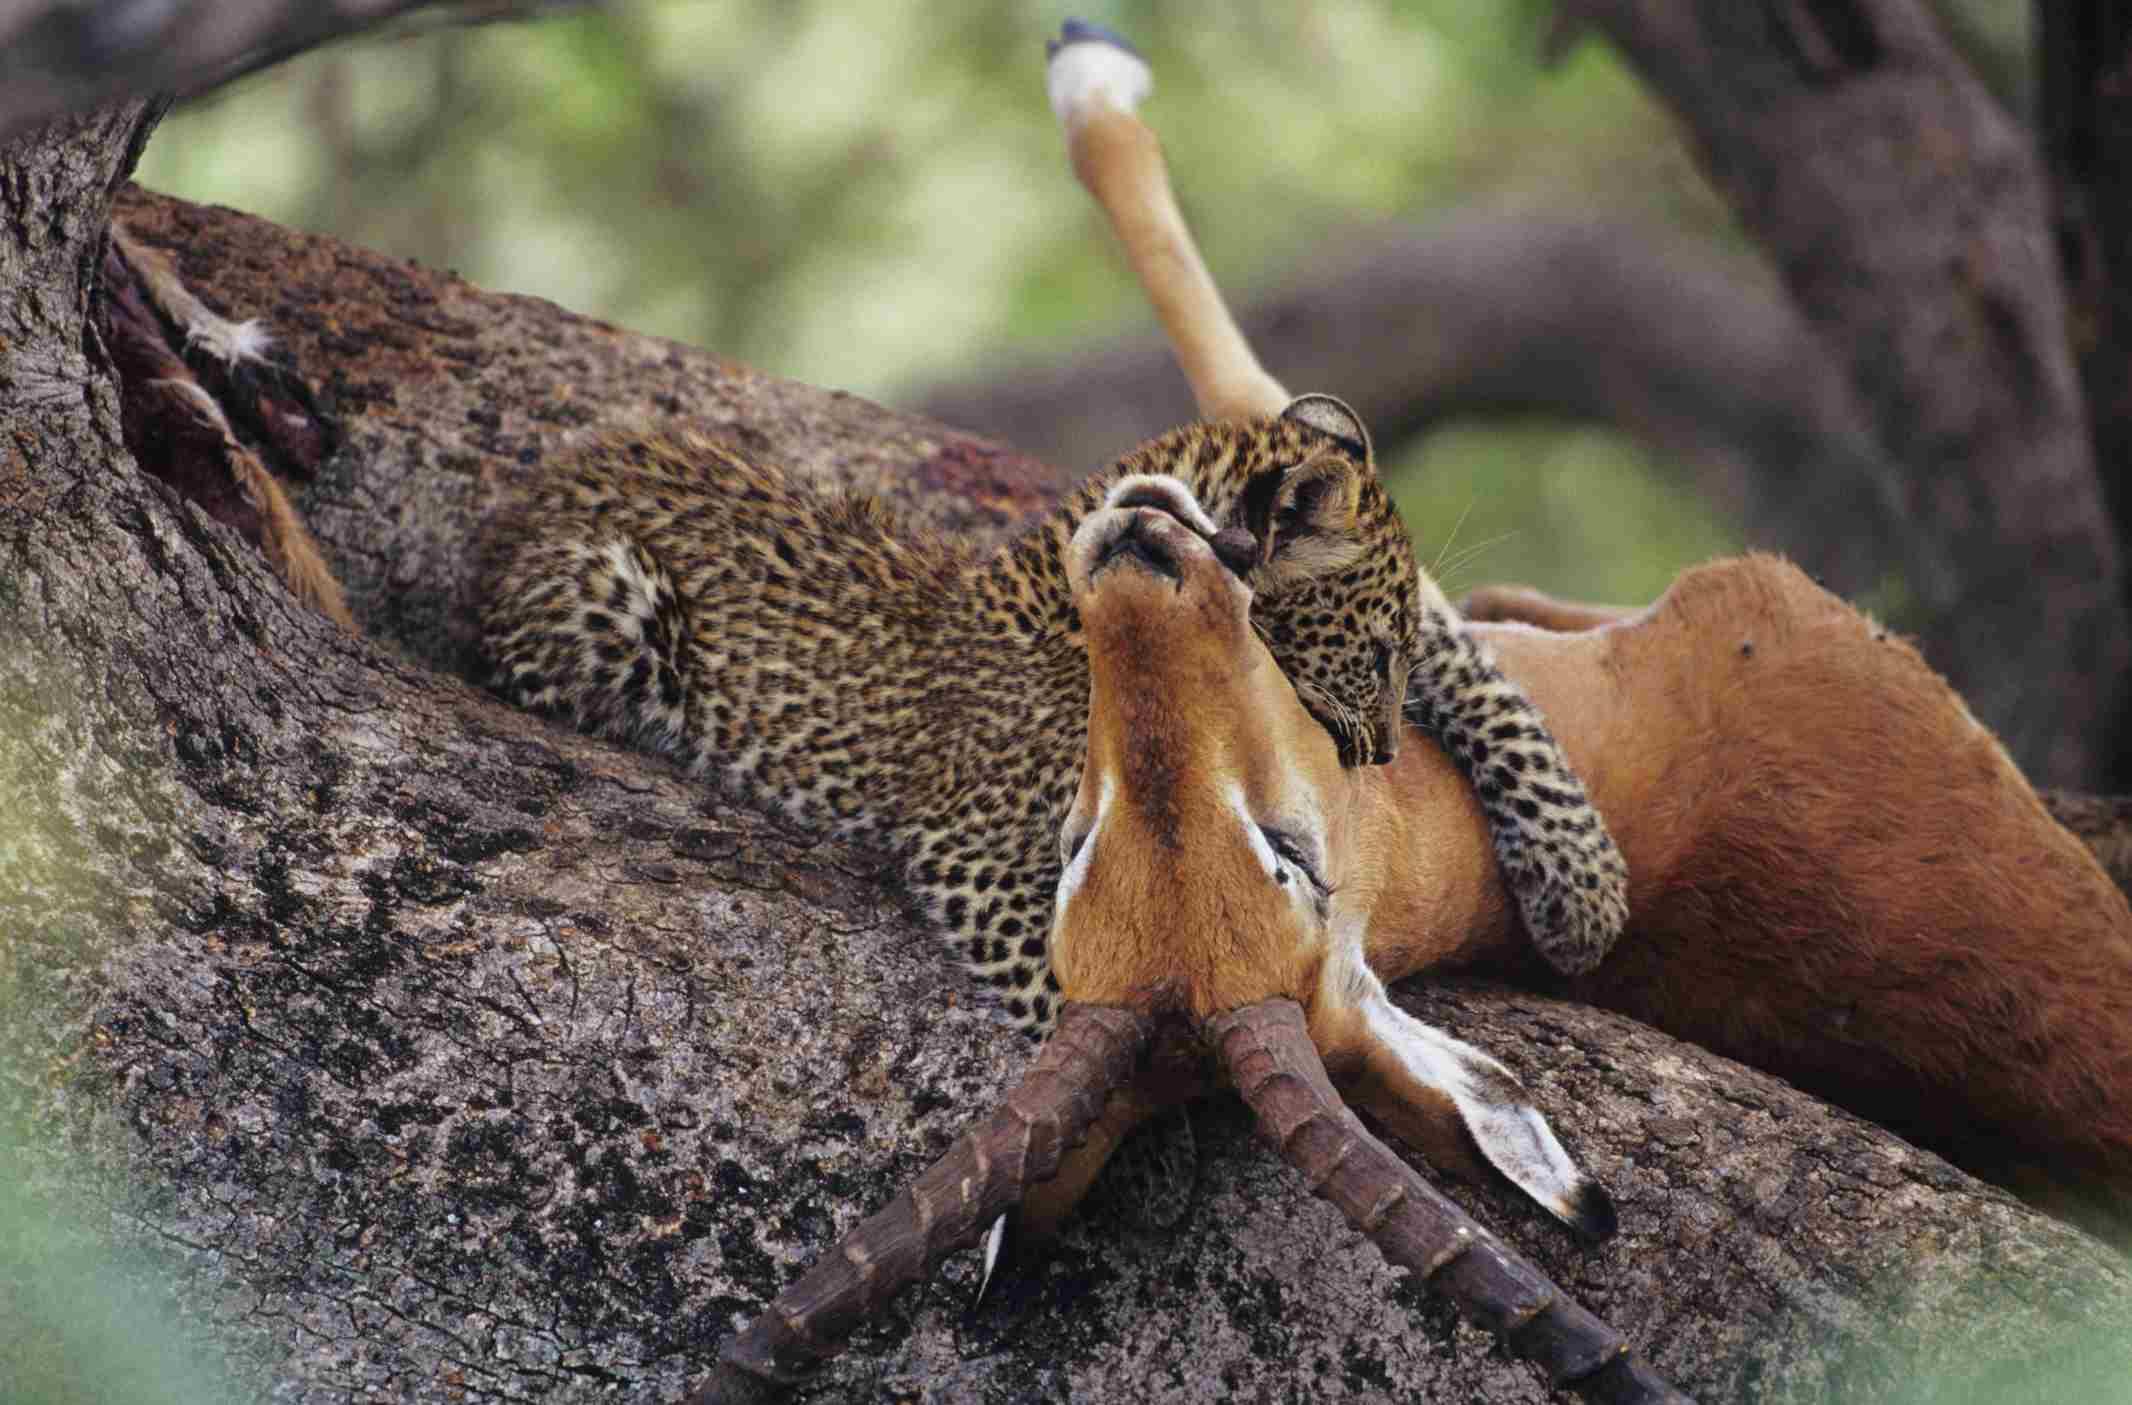 Leopard (Panthera pardus) eating carrion in tree, Kenya